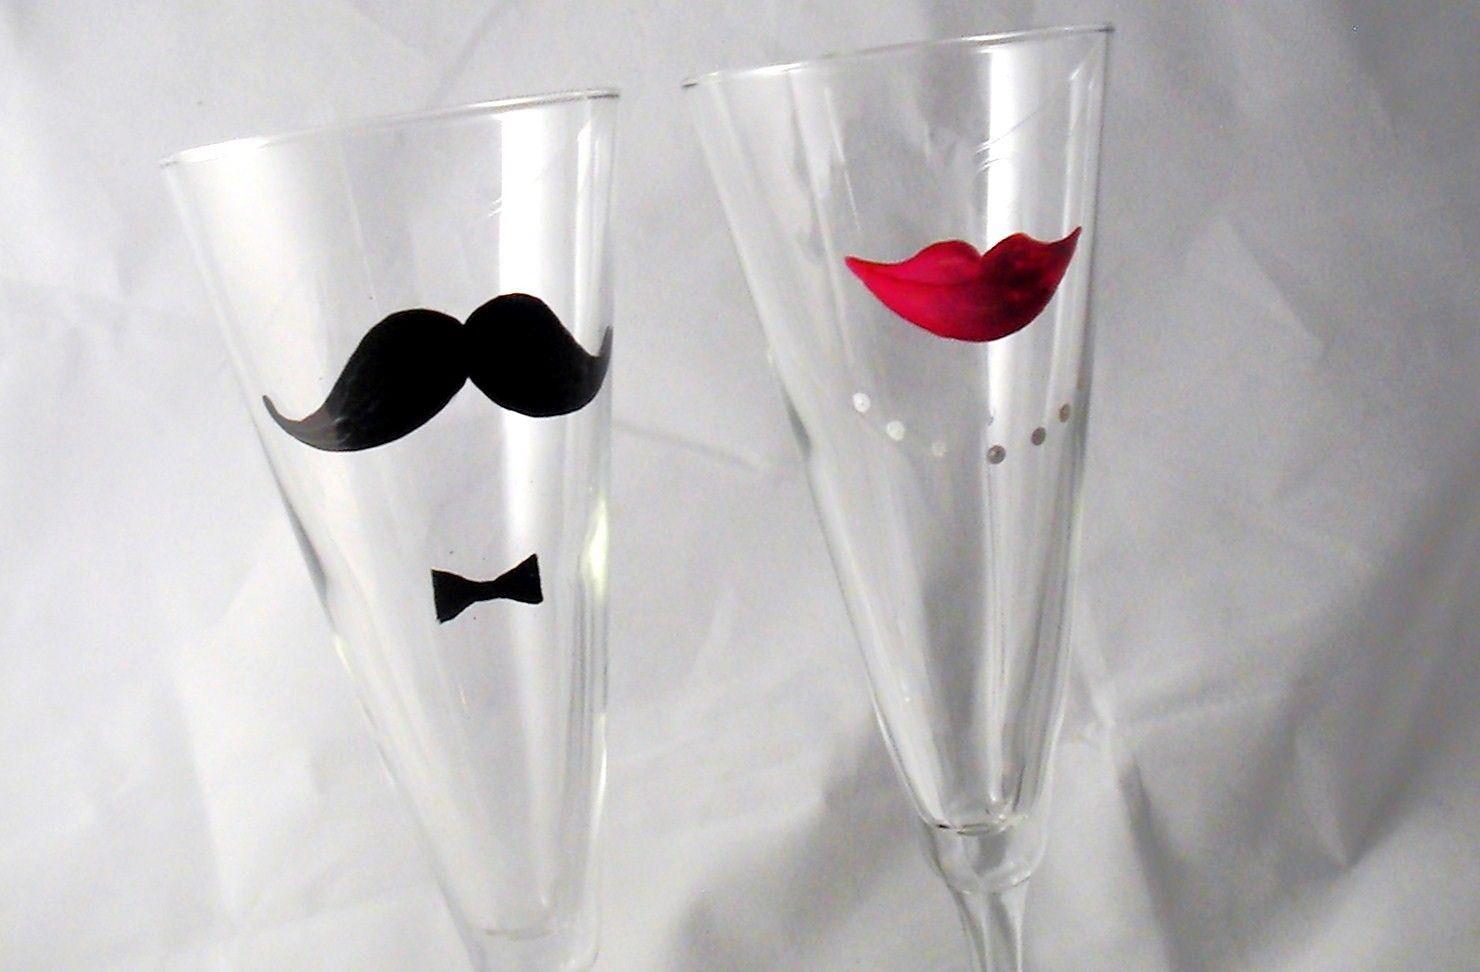 wedding champagne flutes haha these are kinda fun @Megan Lawson | my ...